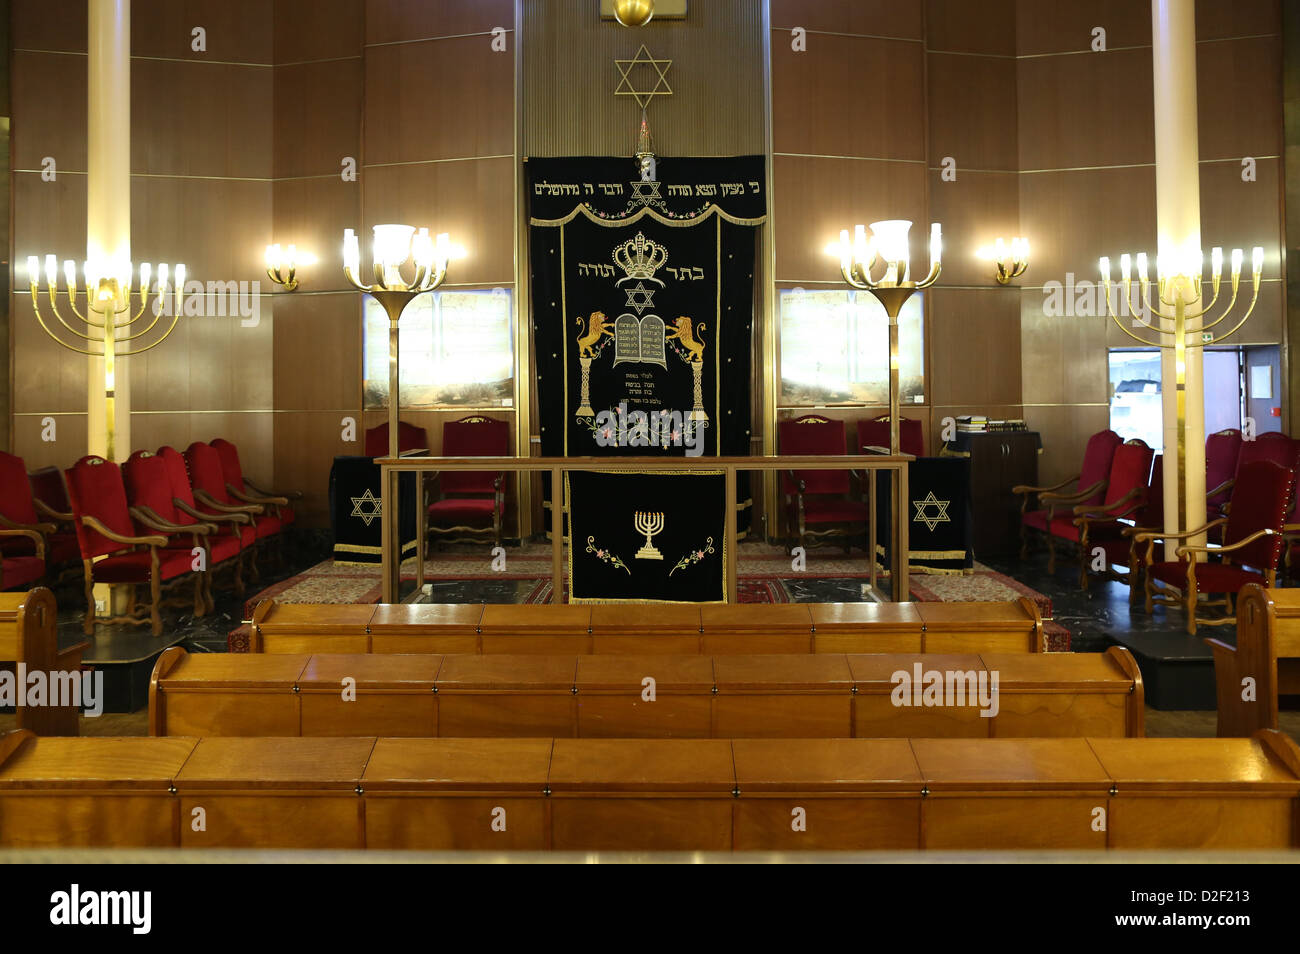 Don Isaac Abravanel synagogue Paris. France. - Stock Image